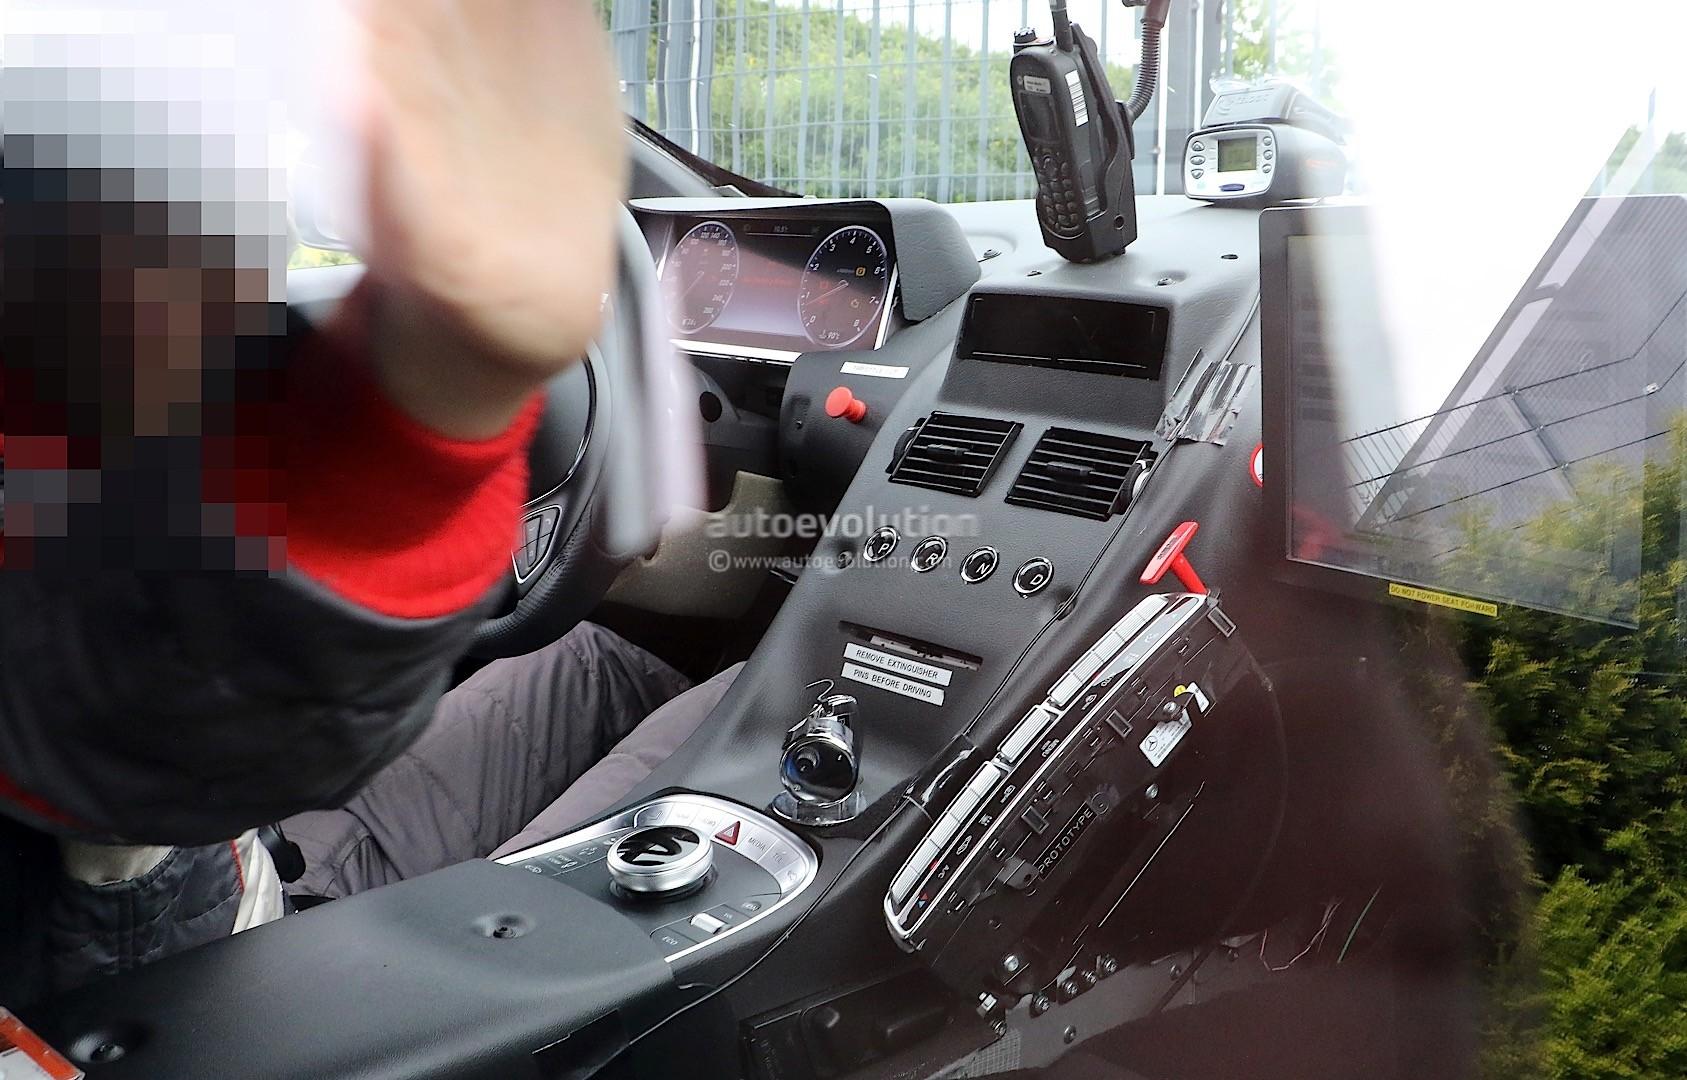 2016 - [Aston Martin] DB11 New-aston-martin-db11-prototype-looks-like-a-work-in-progress-photo-gallery_1